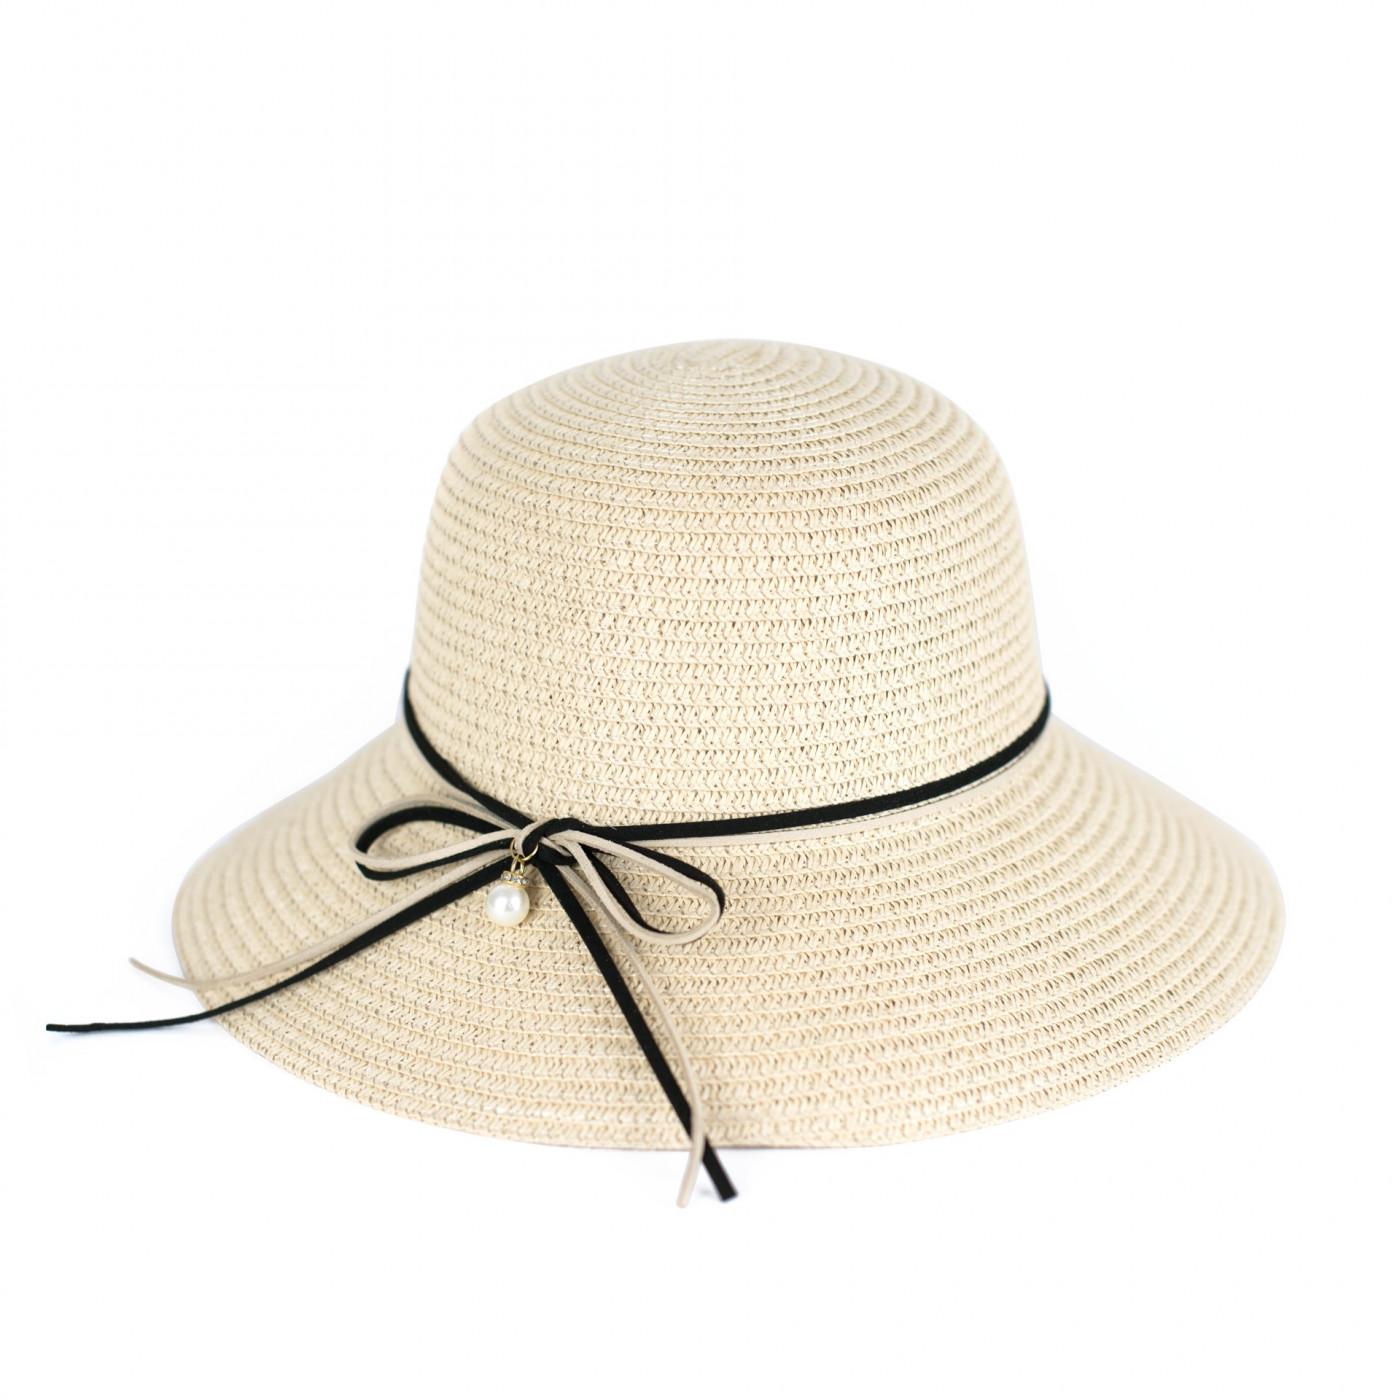 Art Of Polo Woman's Hat cz20146-1